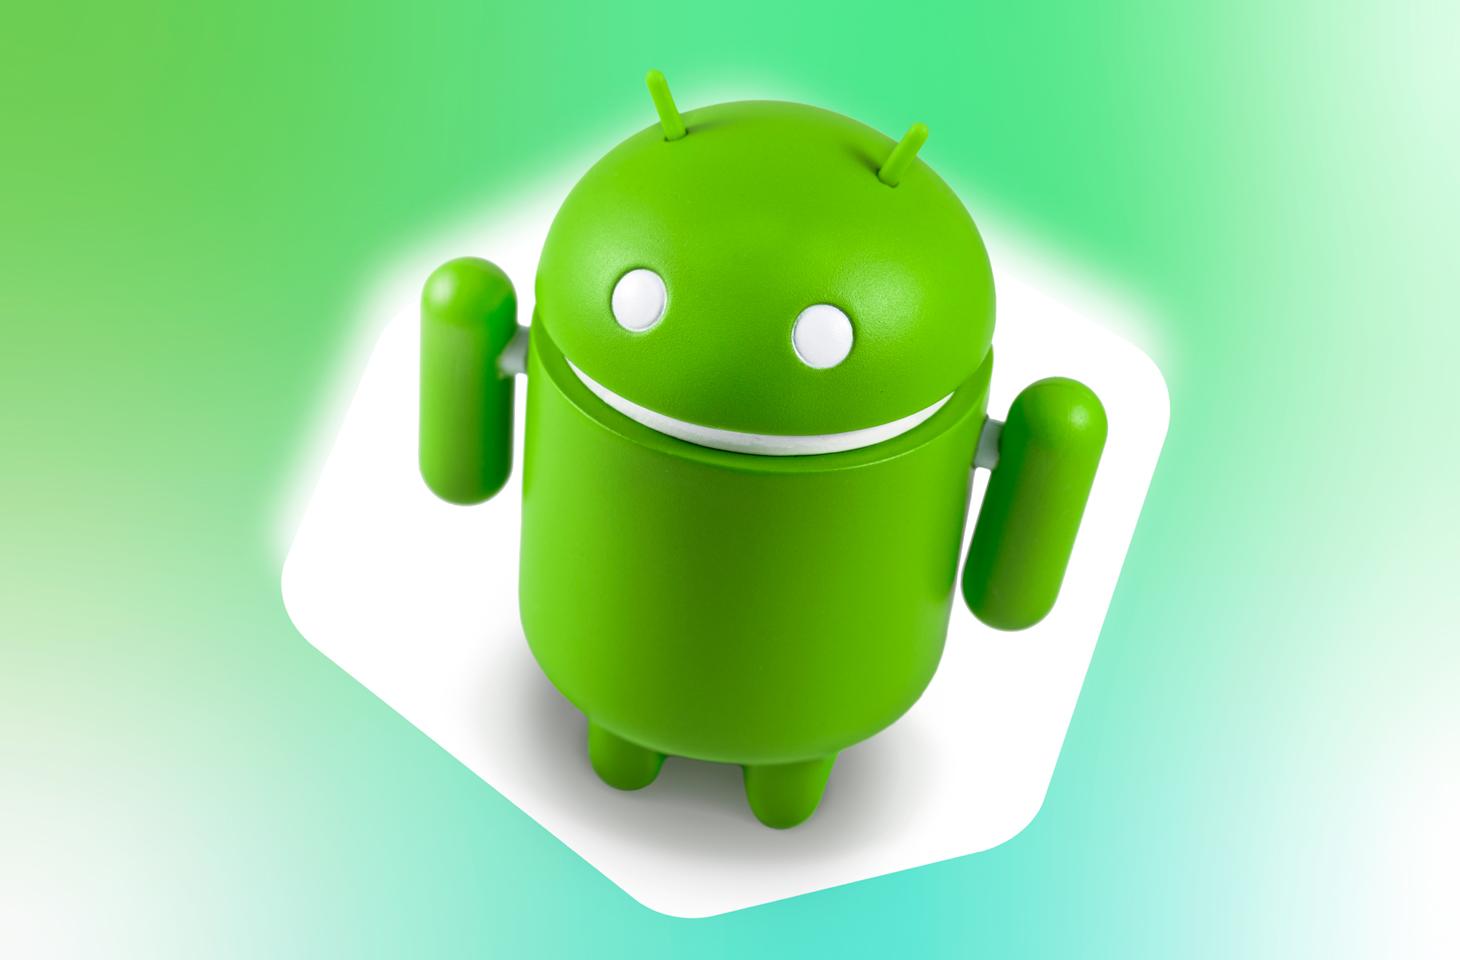 ثغرة خطيرة تهدد نظام Android